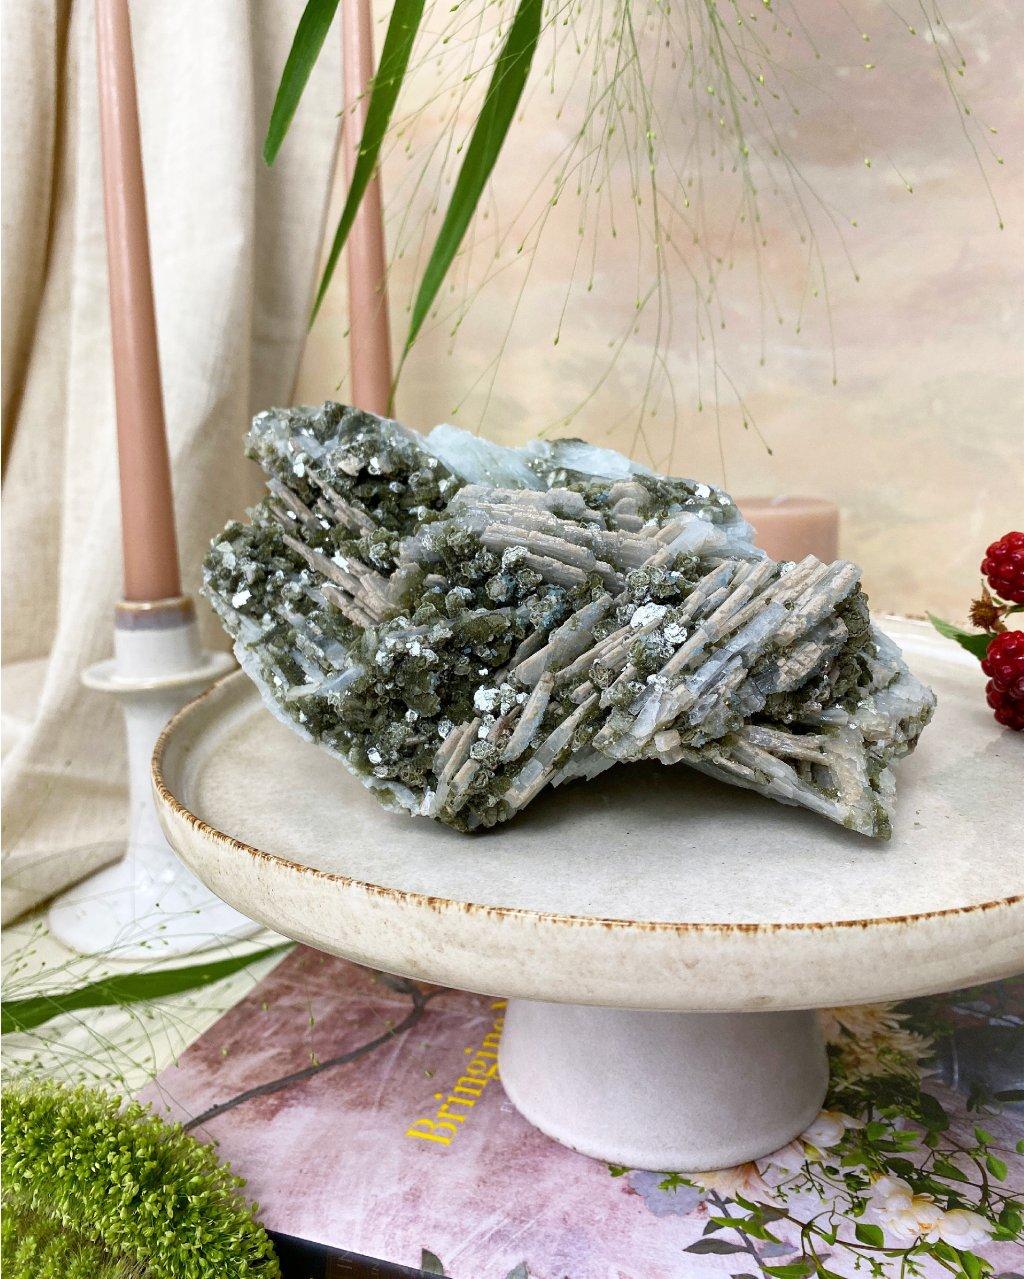 Minerál apatit, albit a muskovit drúza Brazílie 1,7kg